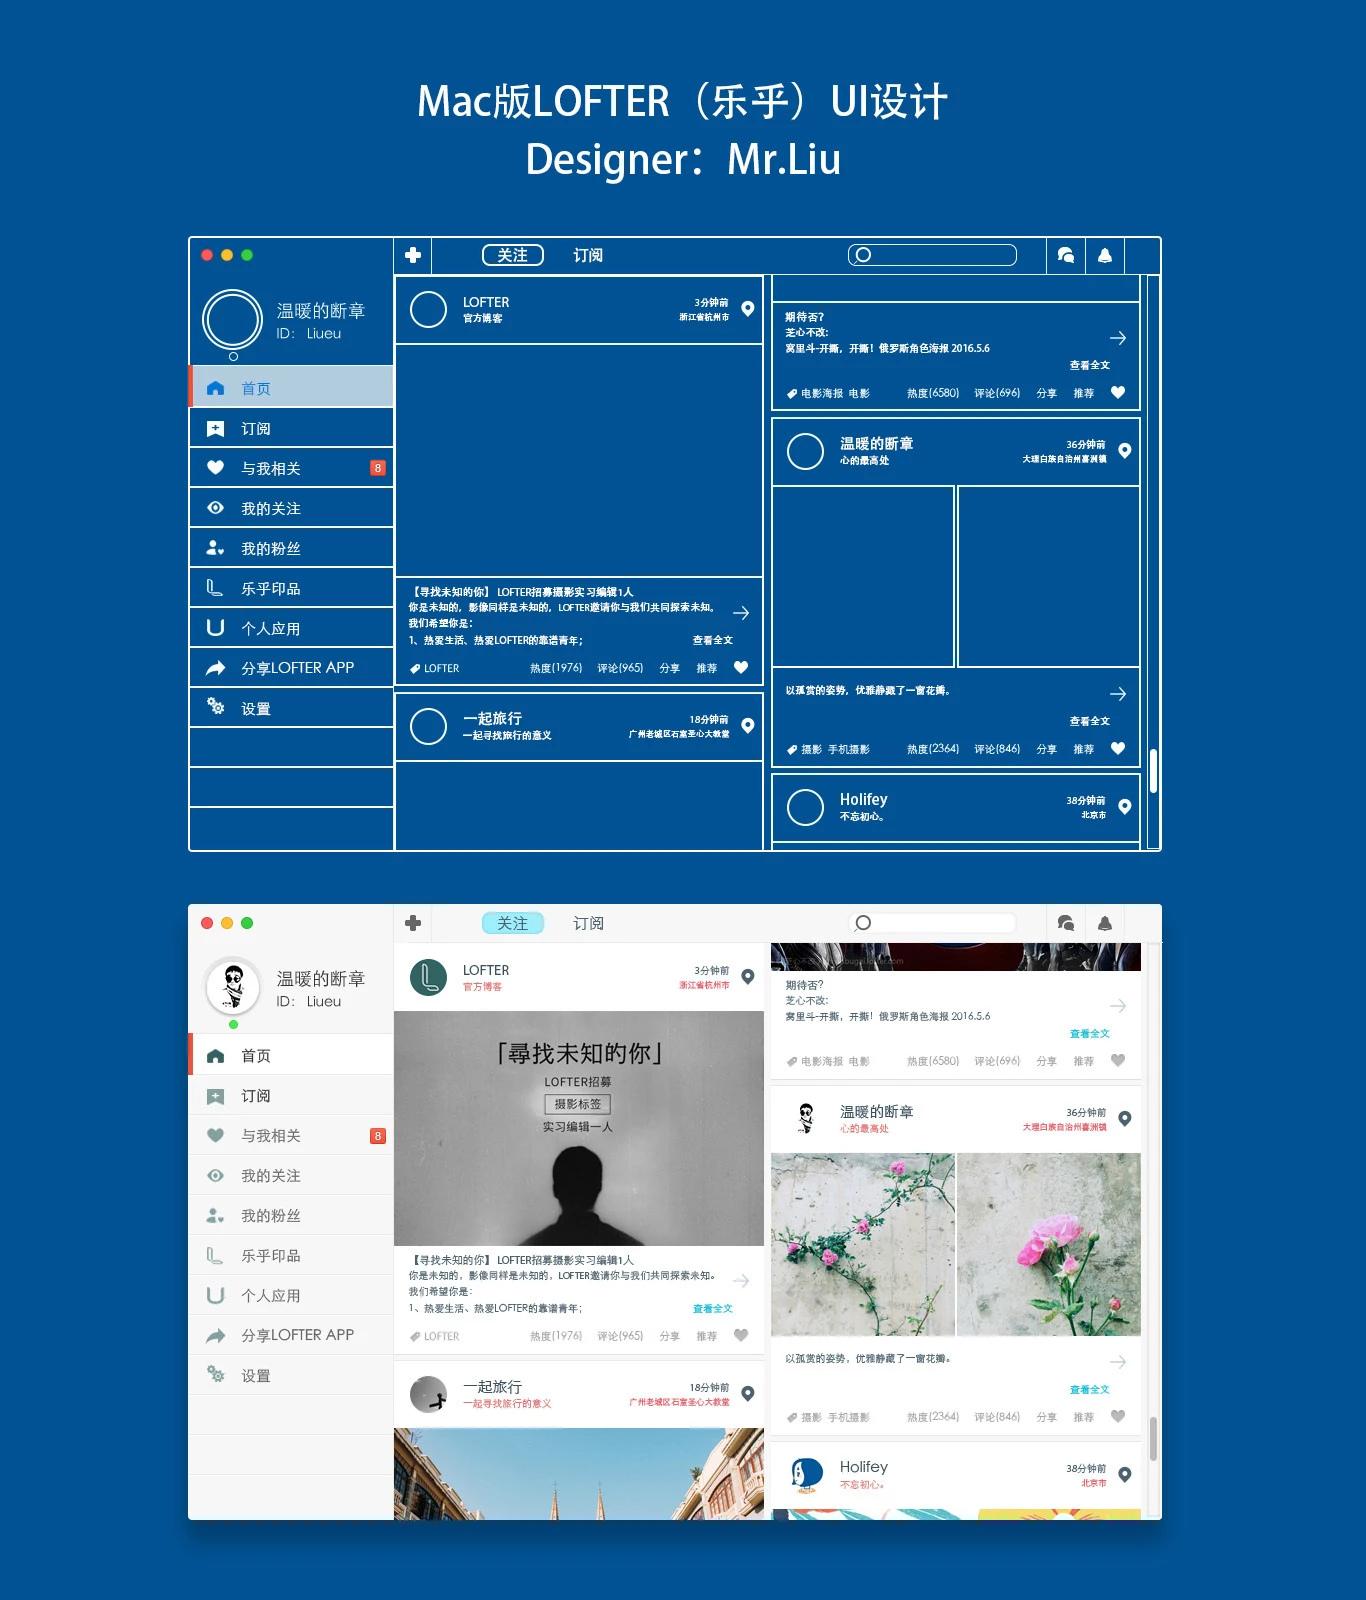 Mac版LOFTER(乐乎)UI设计